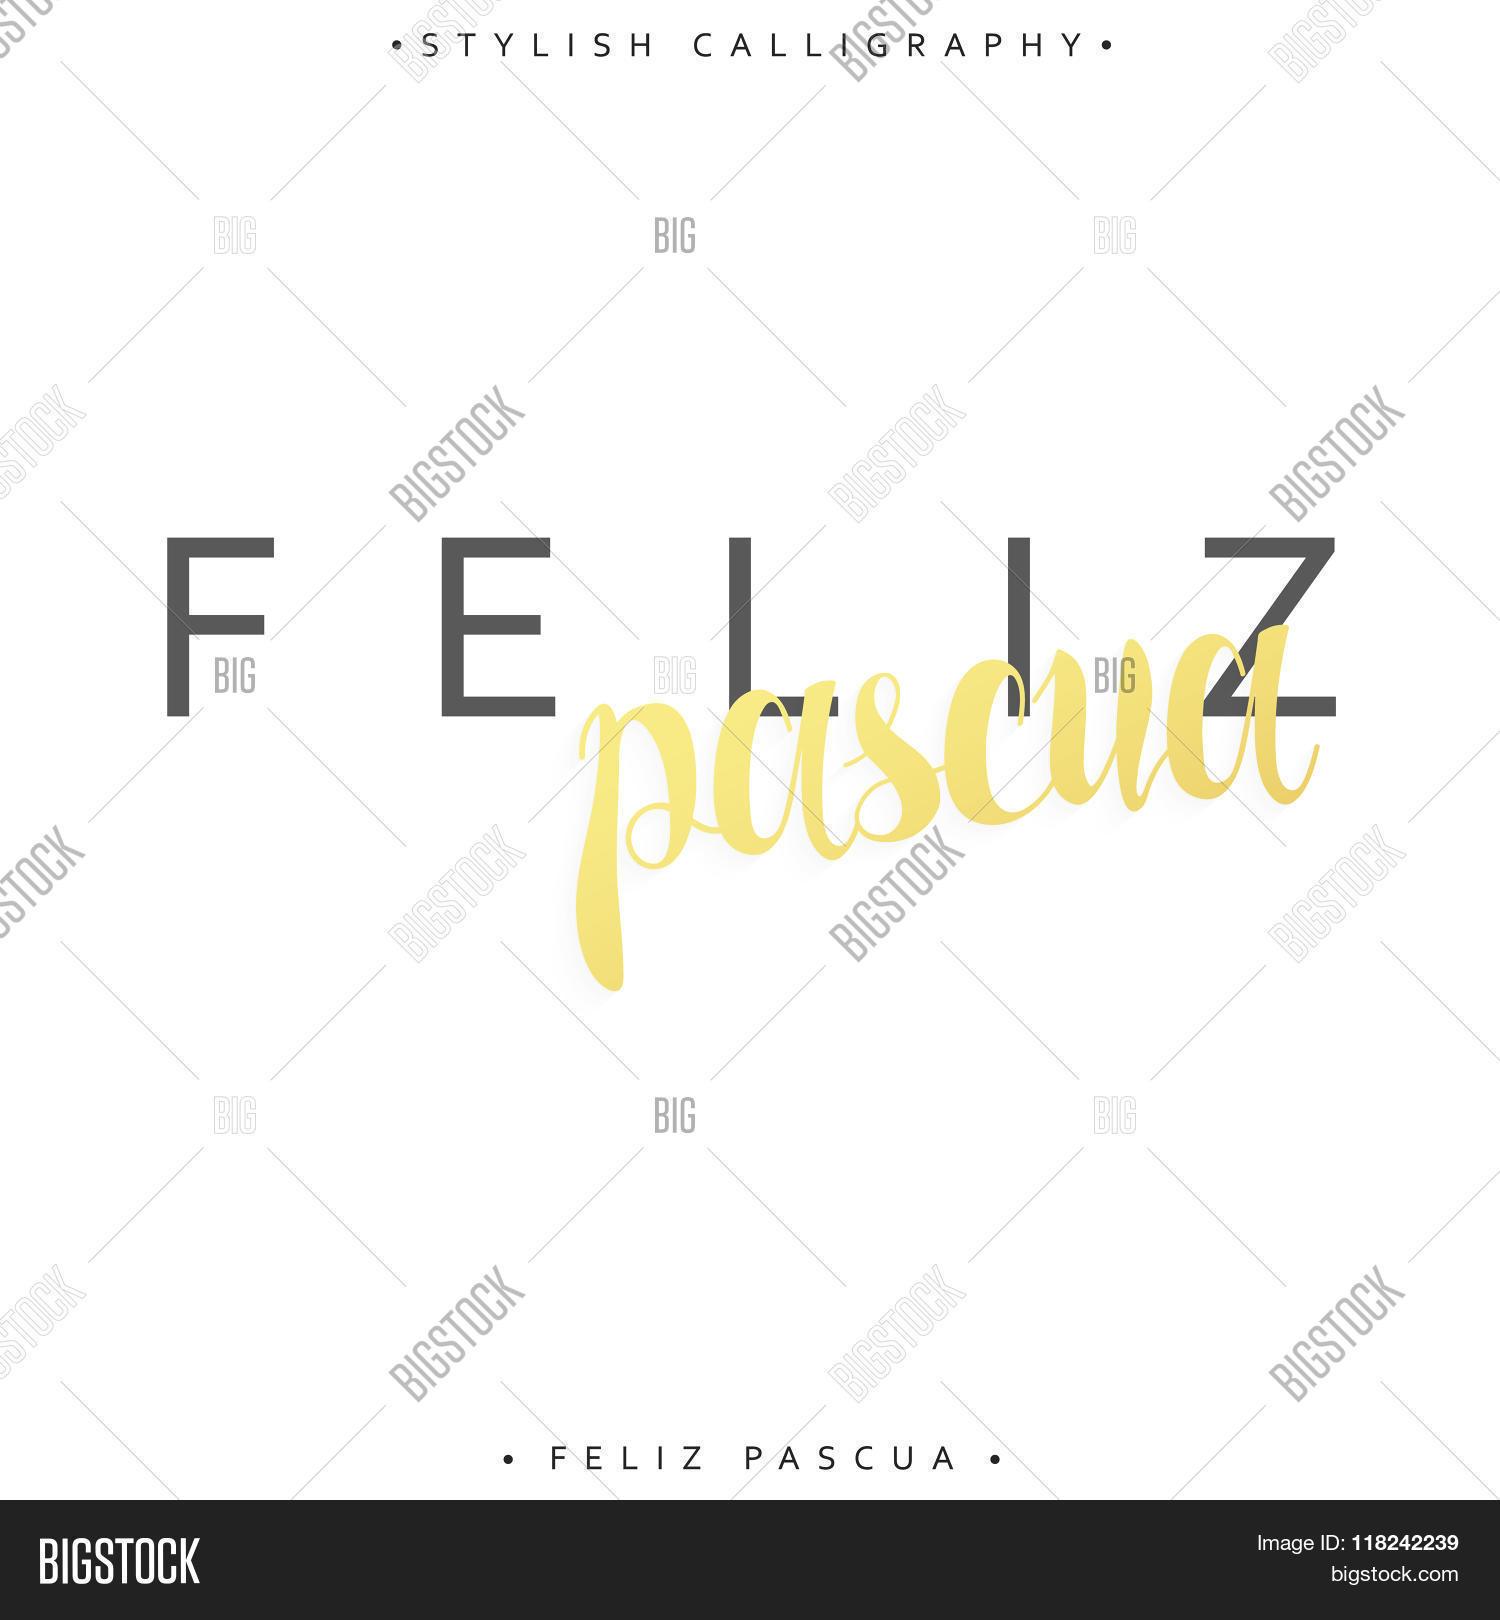 Feliz pascua vector photo free trial bigstock greeting inscription happy easter in spanish m4hsunfo